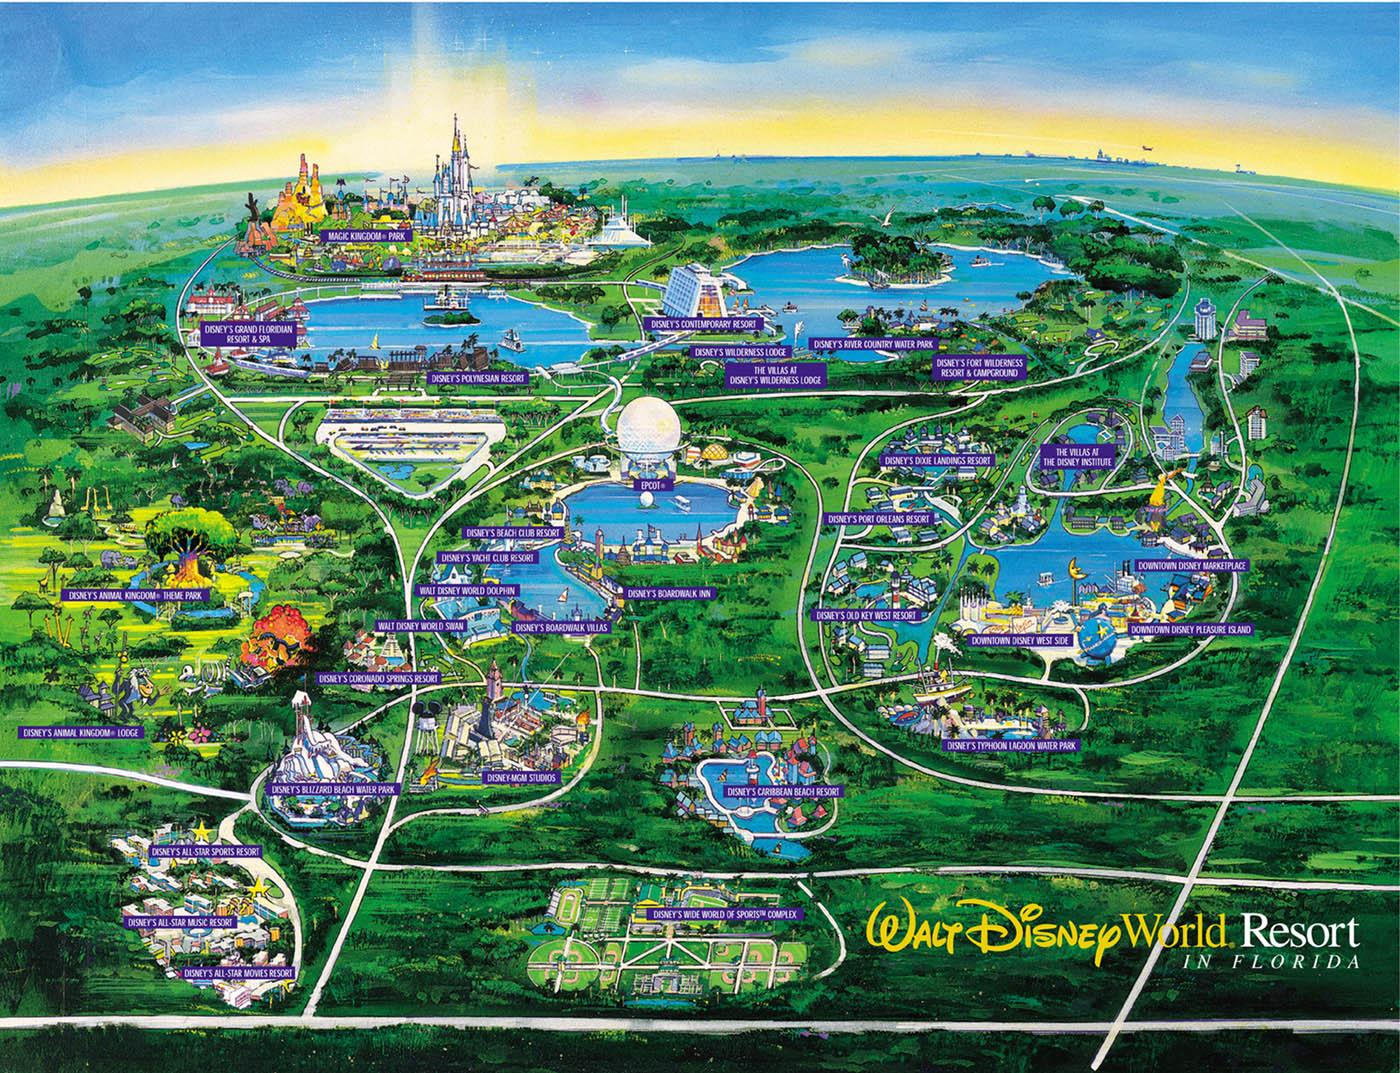 Disneyland Florida Map